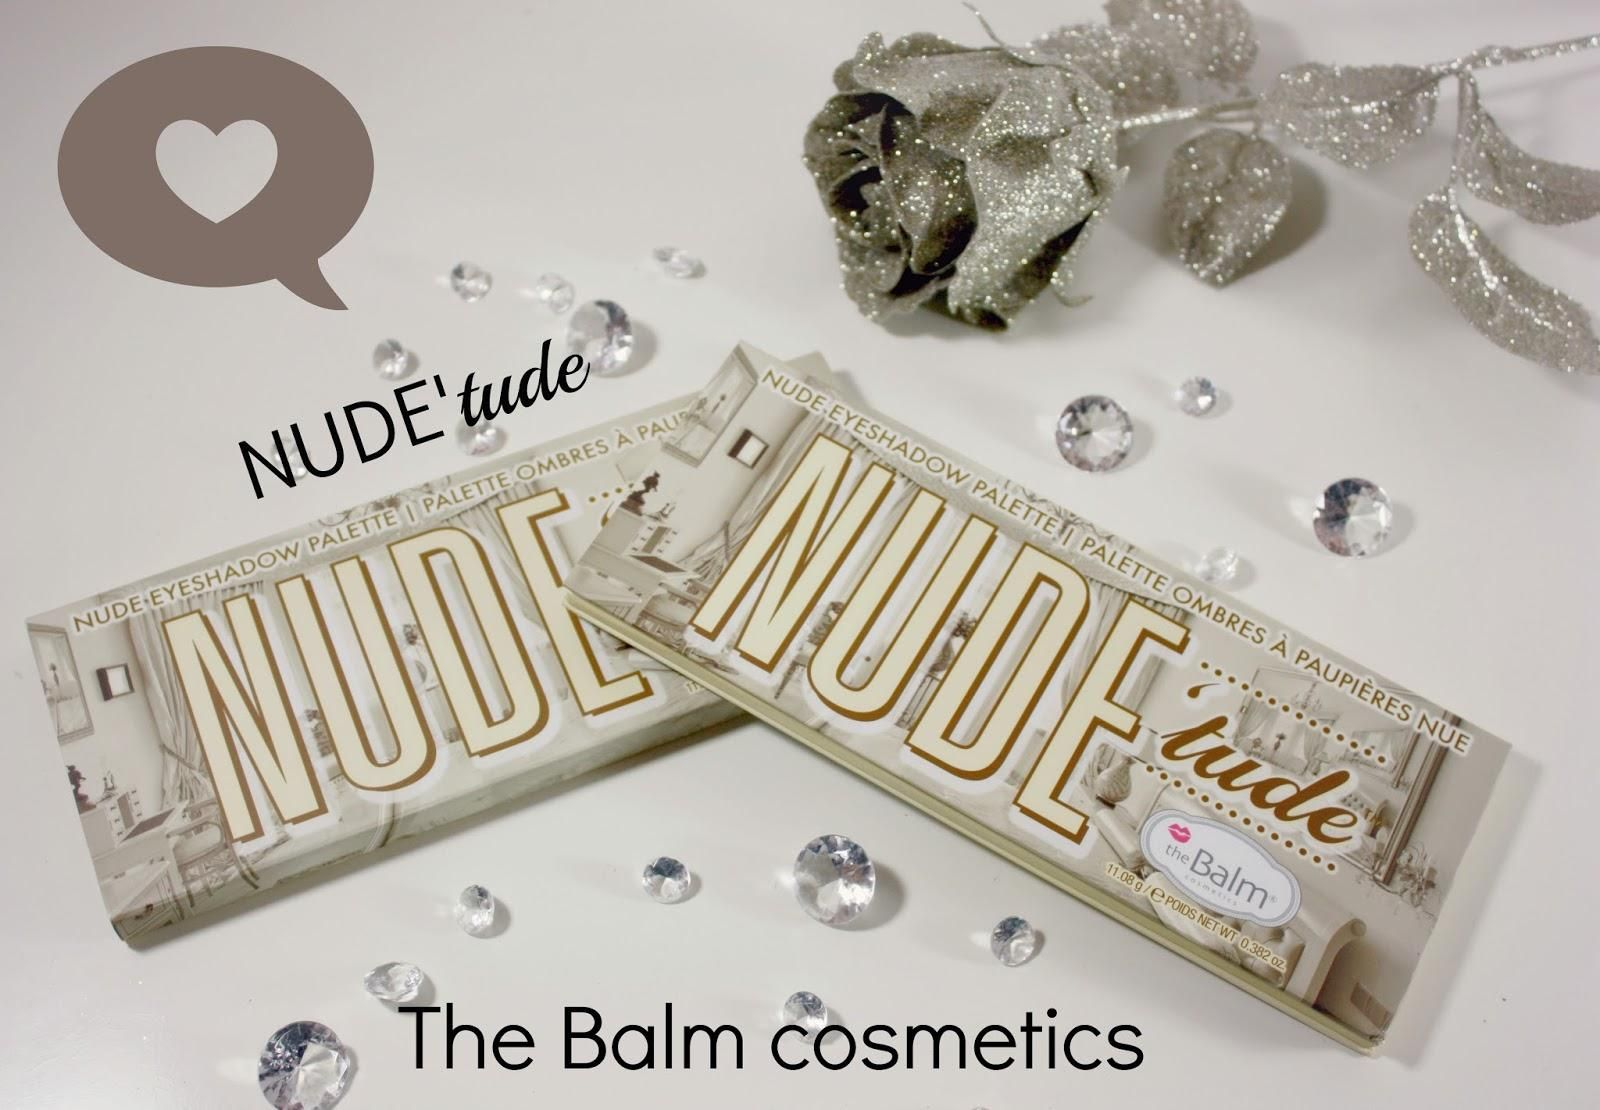 Nude, nude, nude avec The Balm et sa chic palette la Nude'tude!